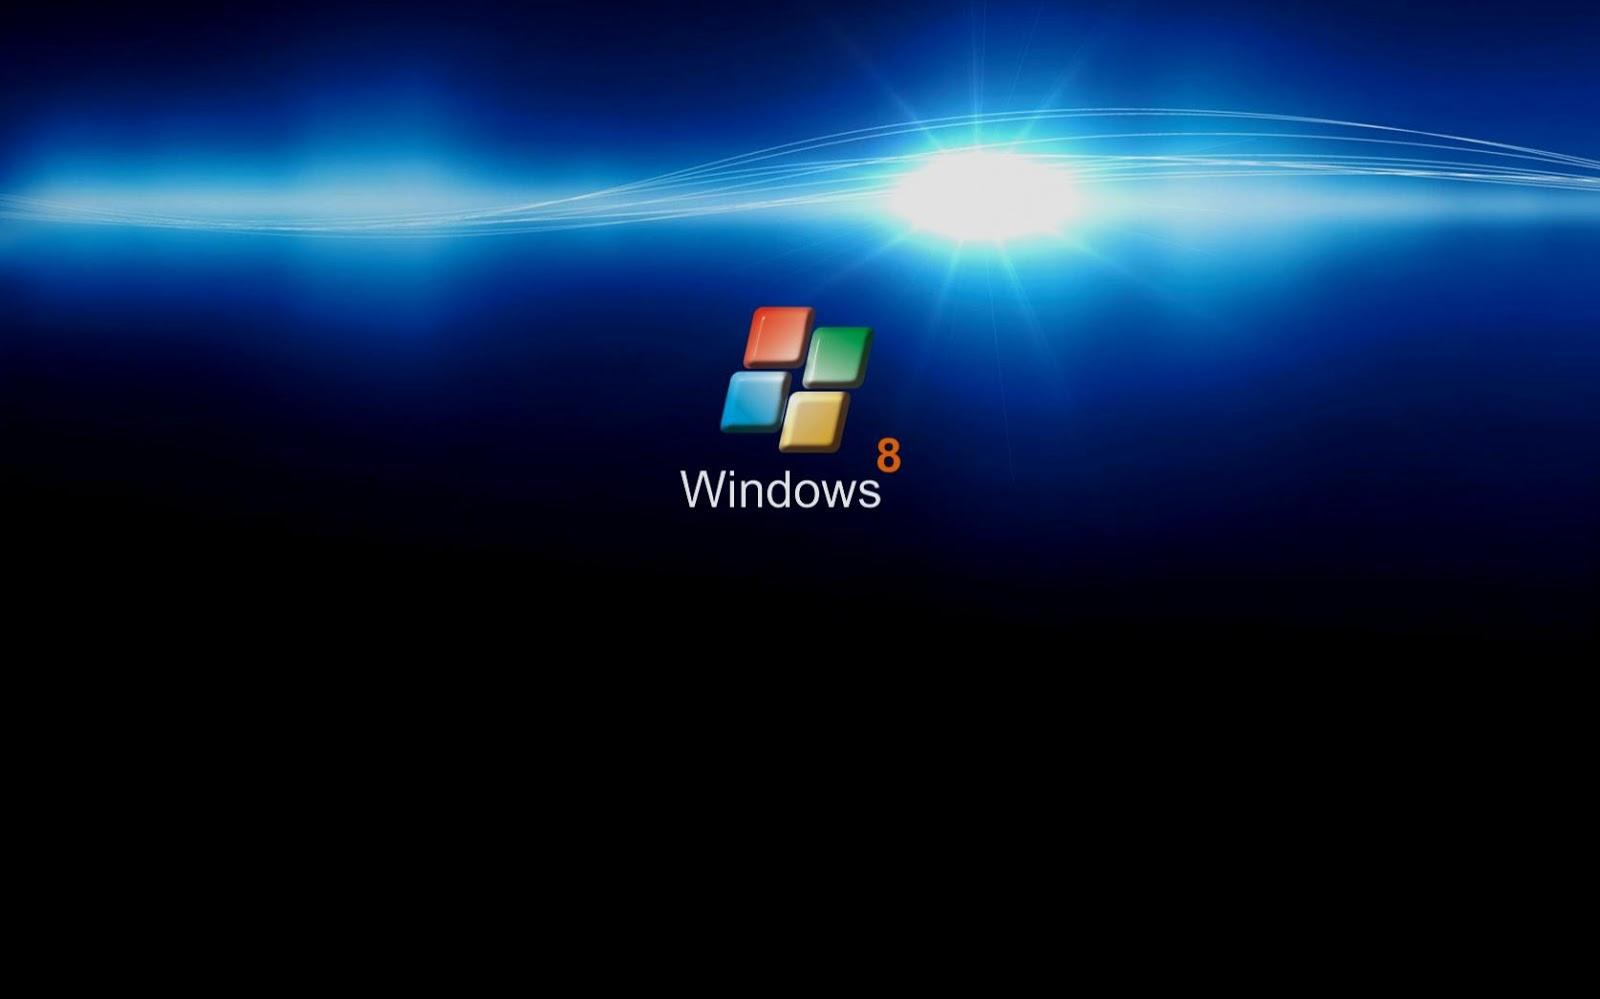 Free Screensavers Windows 8 Desktop